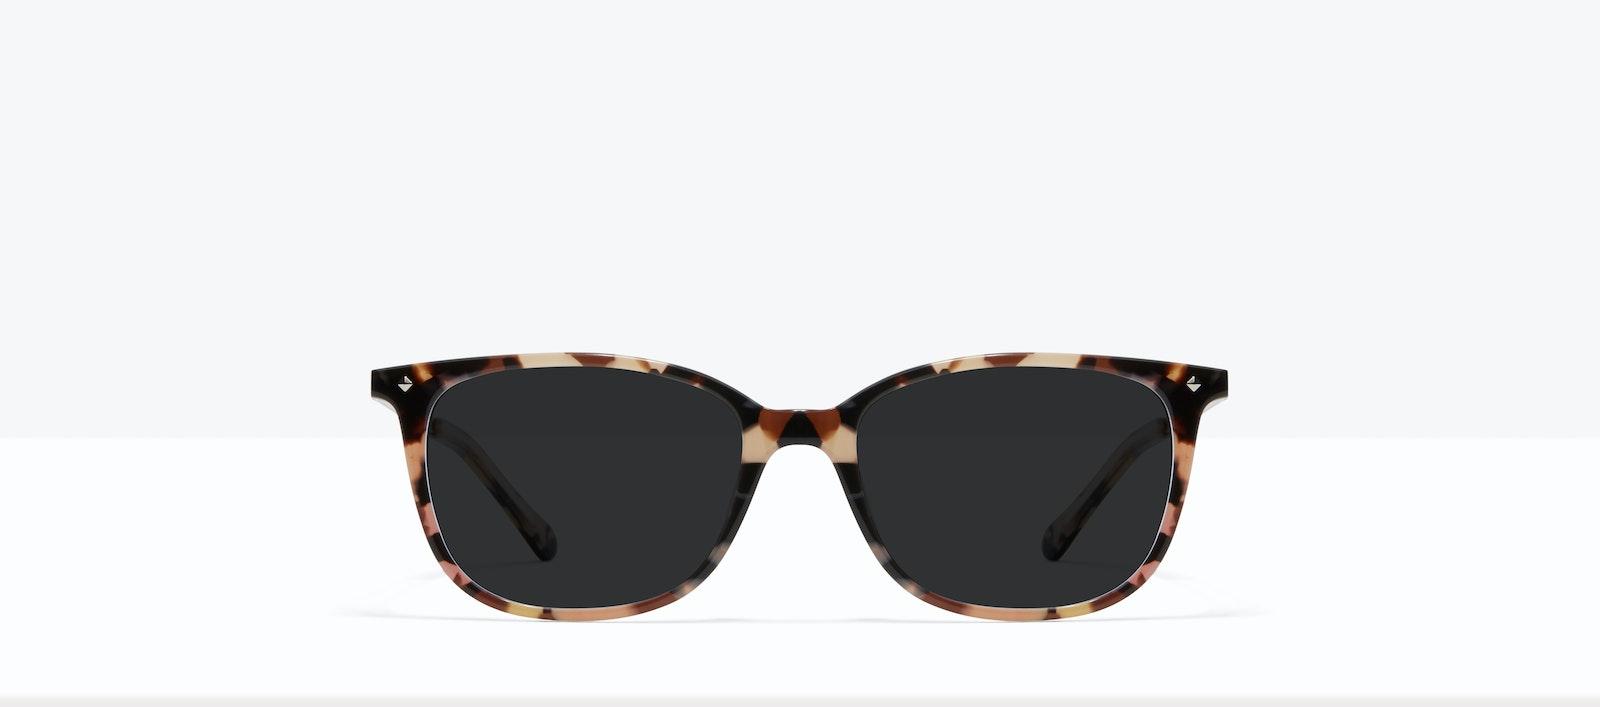 Affordable Fashion Glasses Rectangle Square Sunglasses Women Refine S Pastel Tort Front